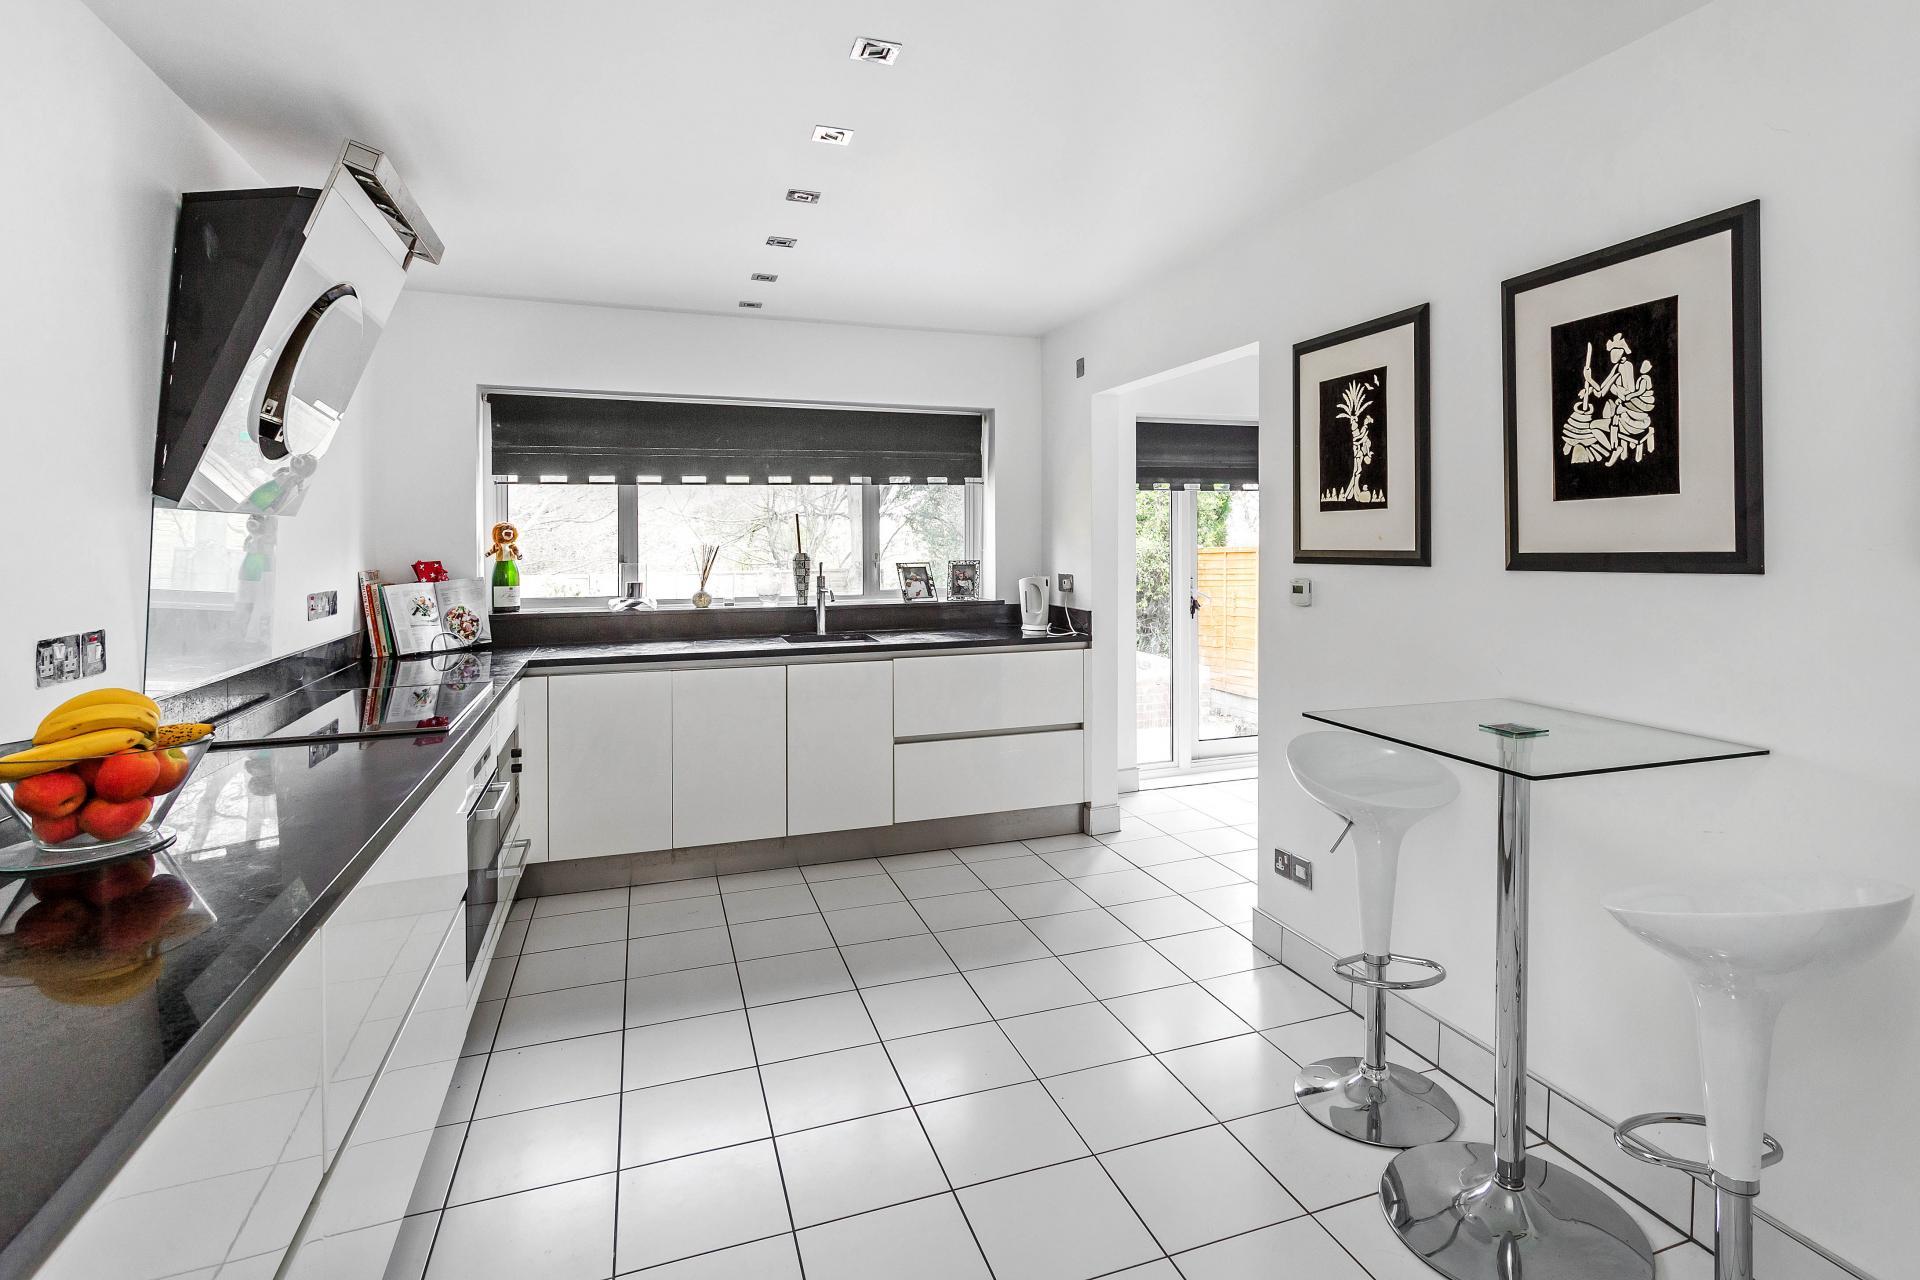 £900,000 - Croydon - 5 bedrooms